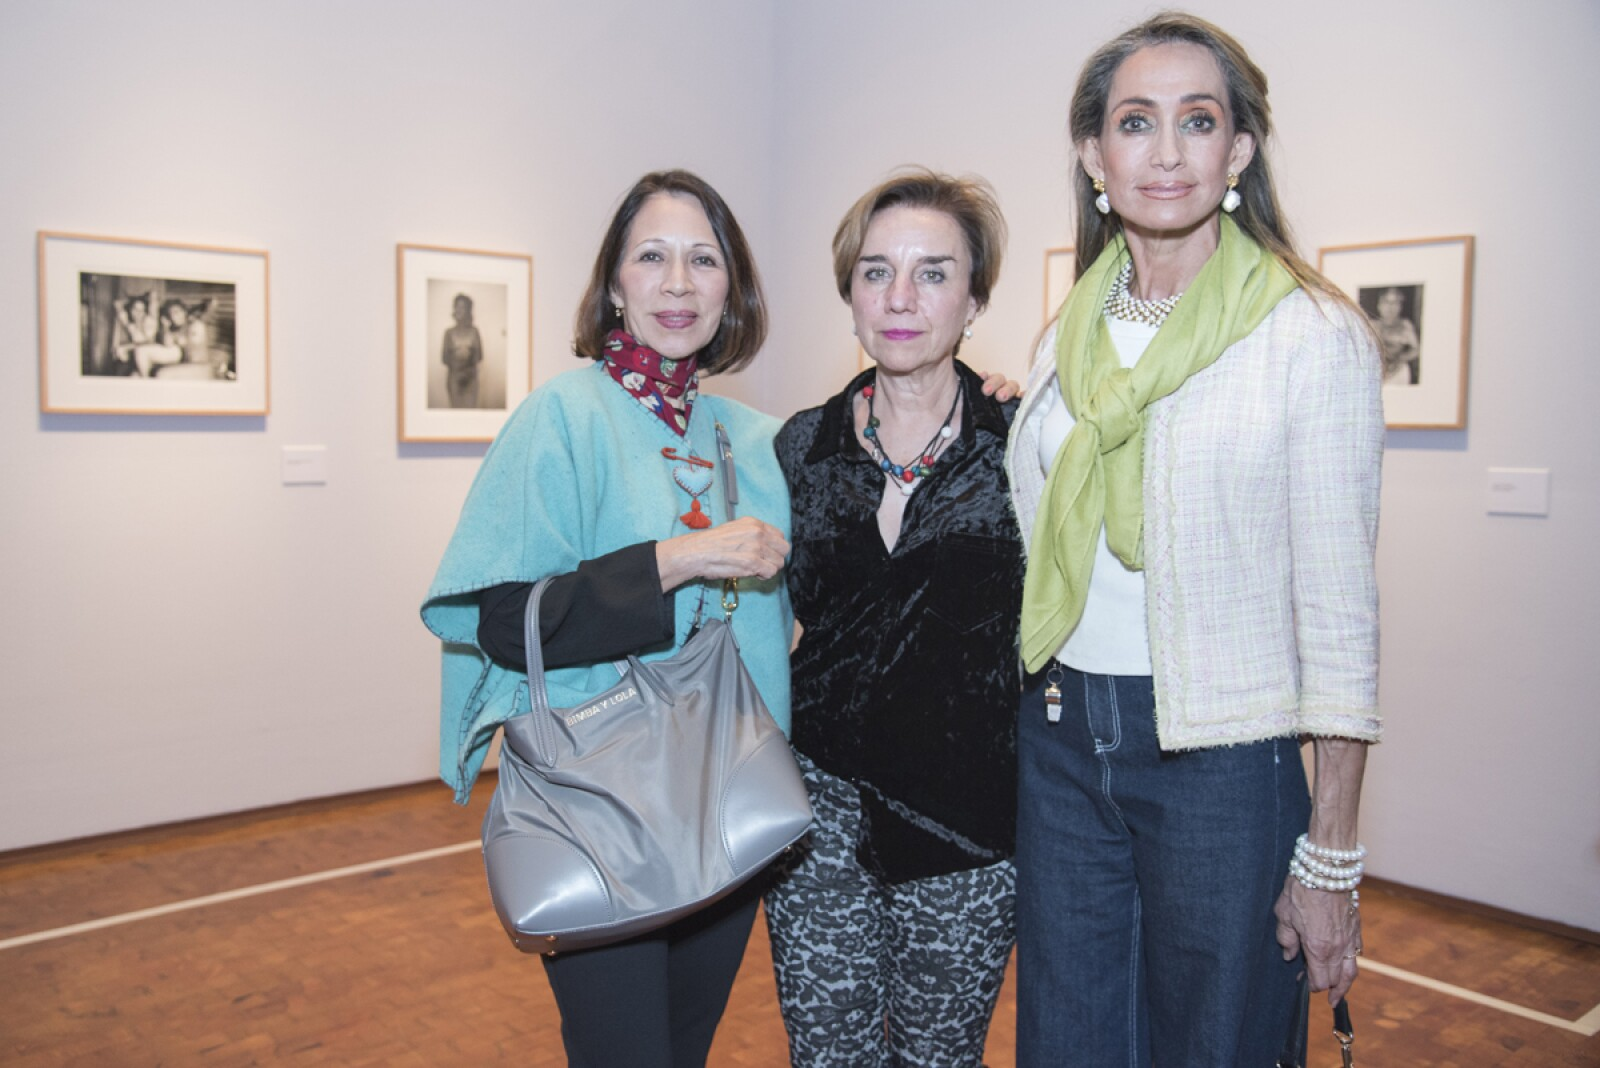 QUIE Graciela Iturbide Coctel 09-02-19 Nancy Lopez21.jpg